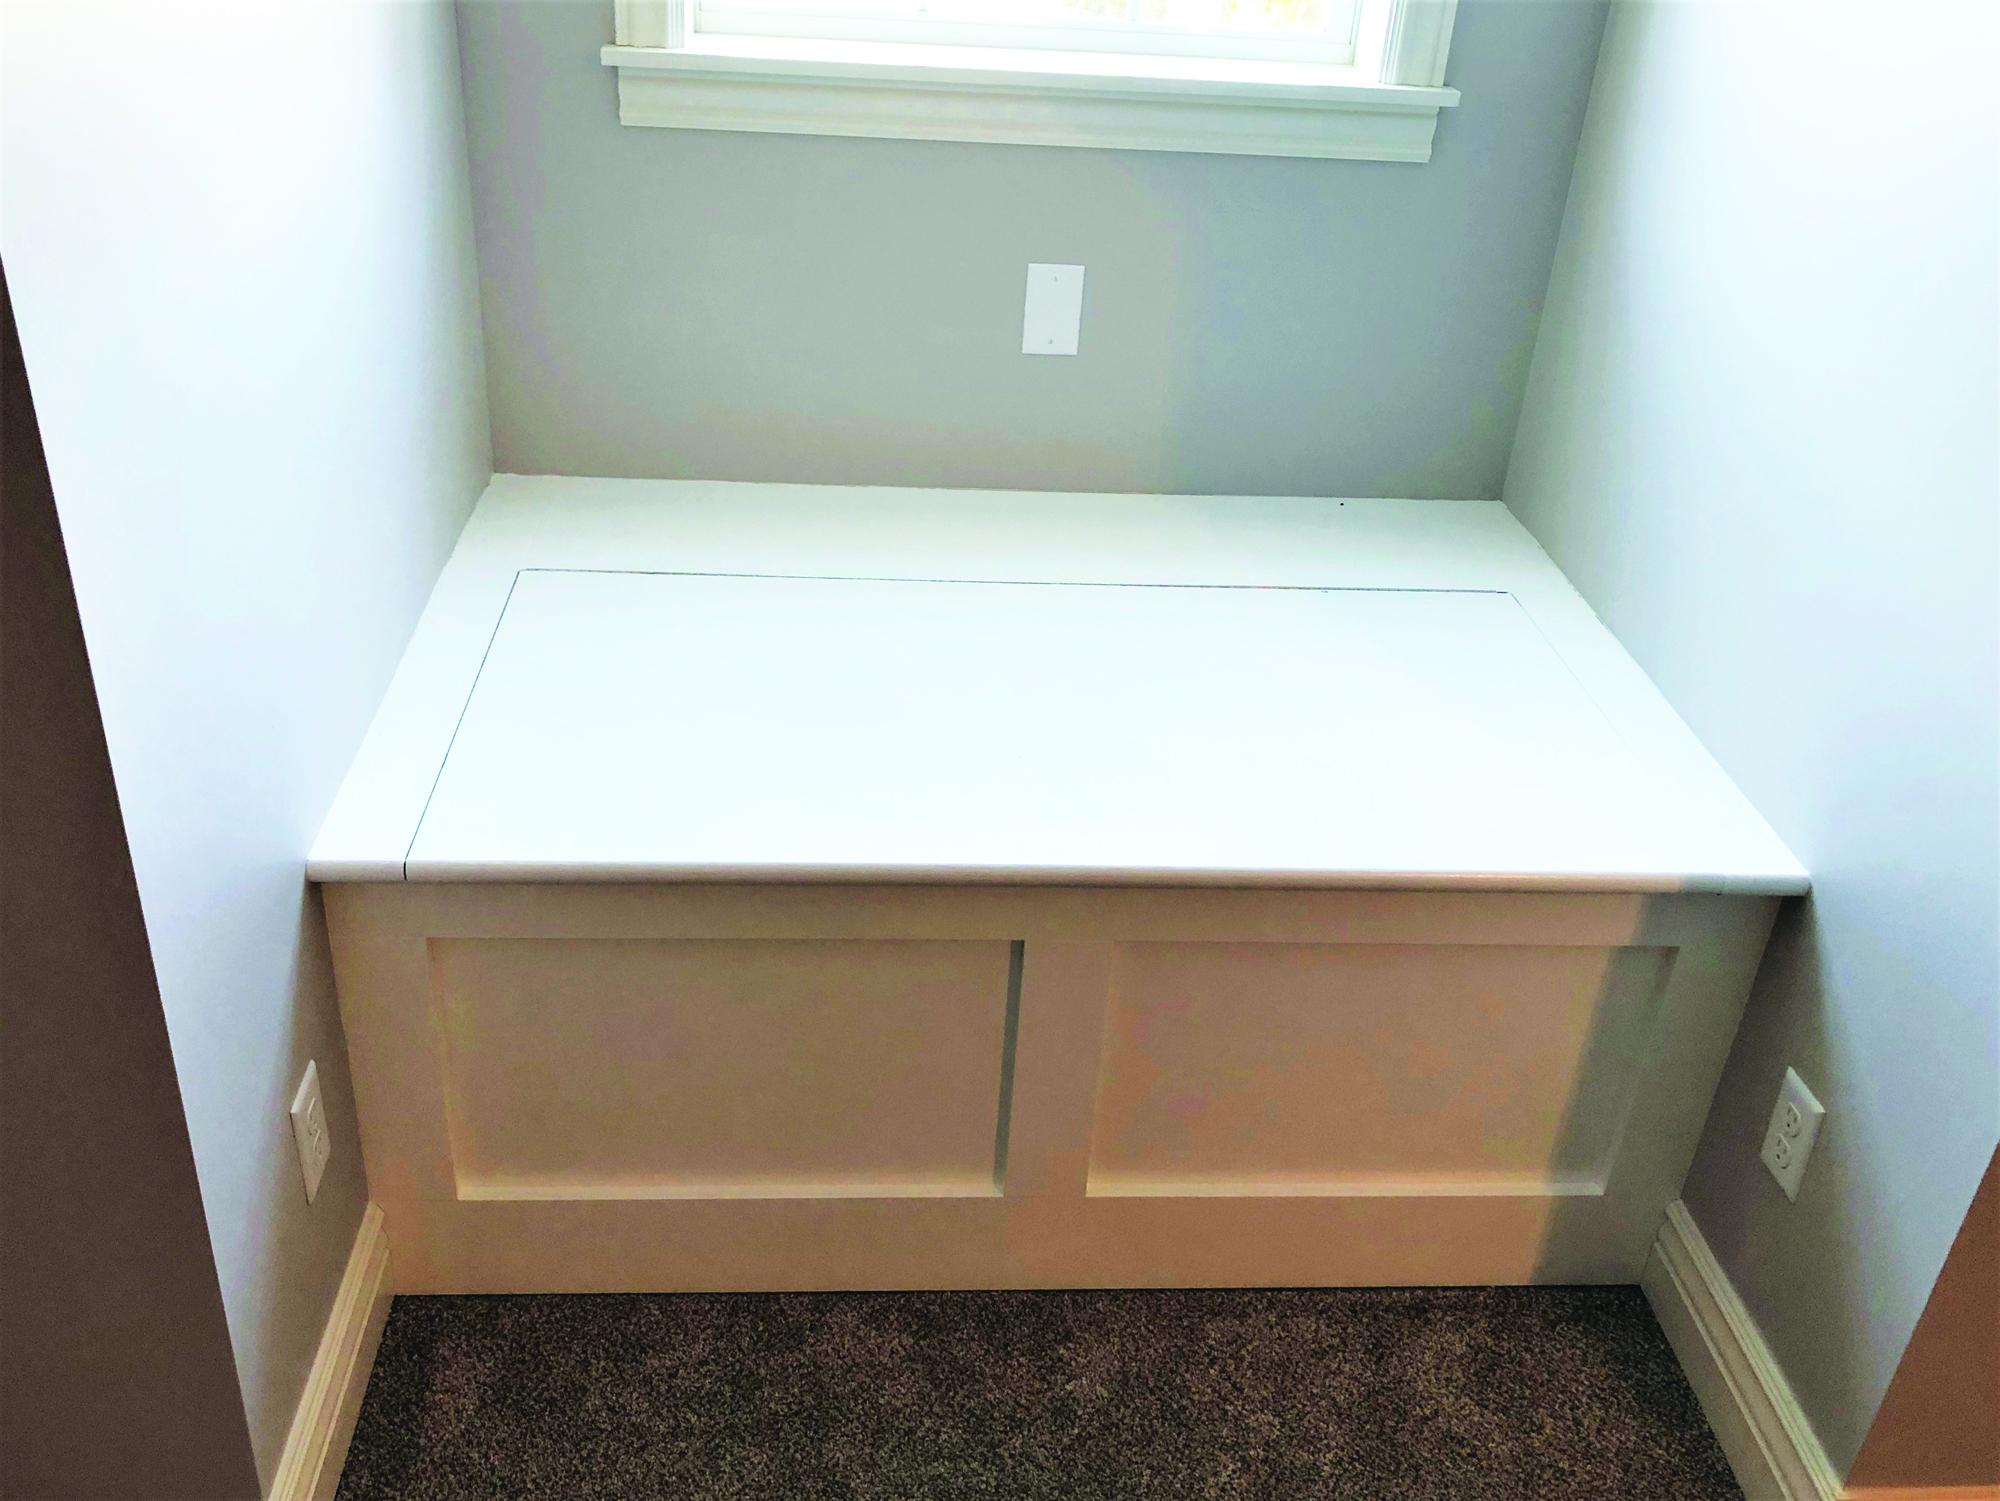 Astounding A Useful Built In Window Seat Jlc Online Uwap Interior Chair Design Uwaporg